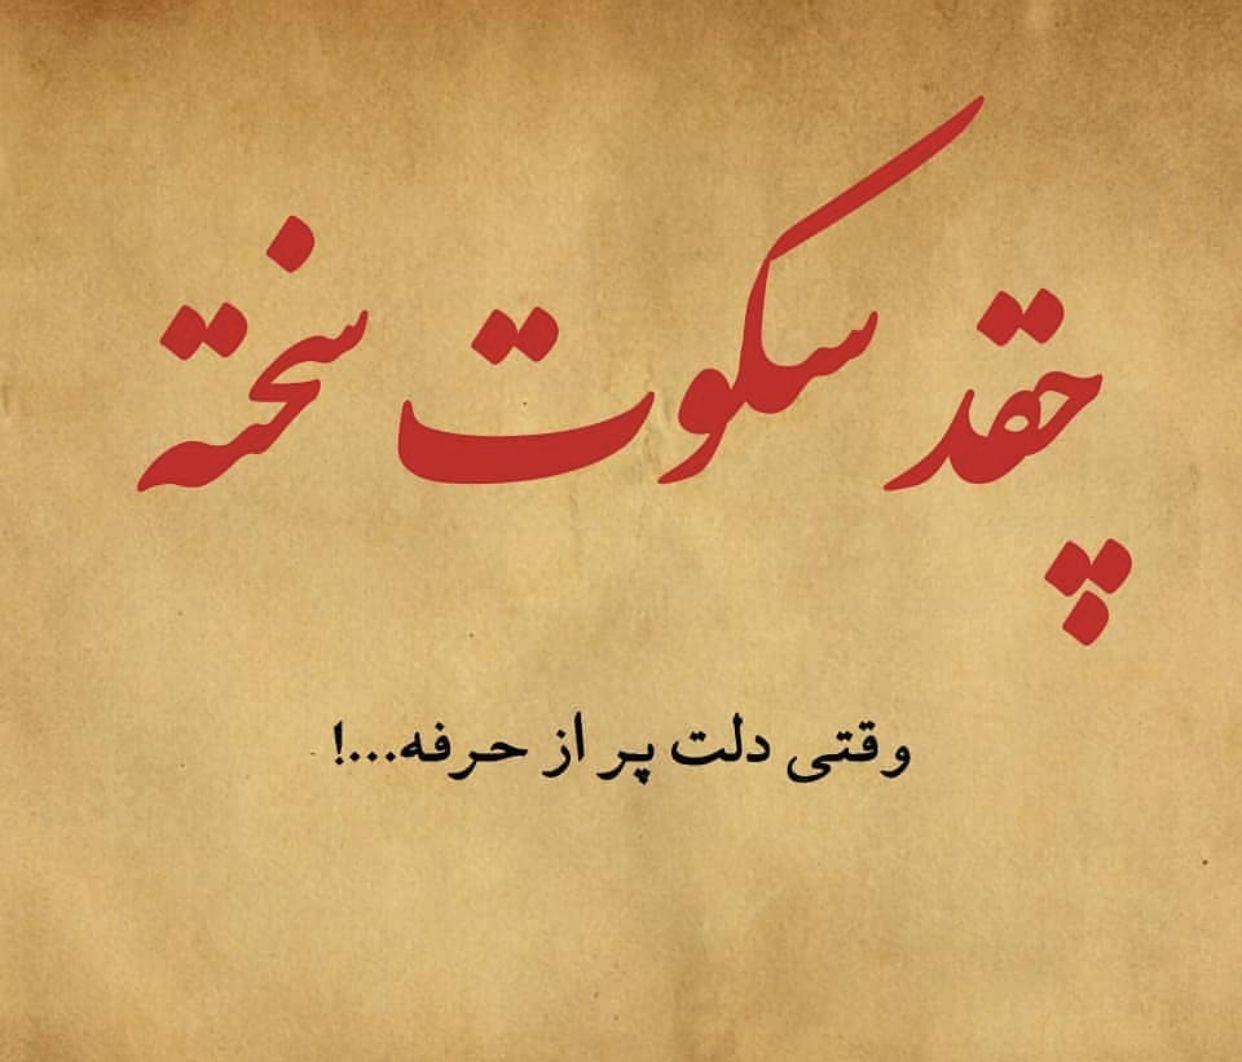 Photo of جملات سکوت عشق + متن های زیبا و غمگین سکوت عاشقانه